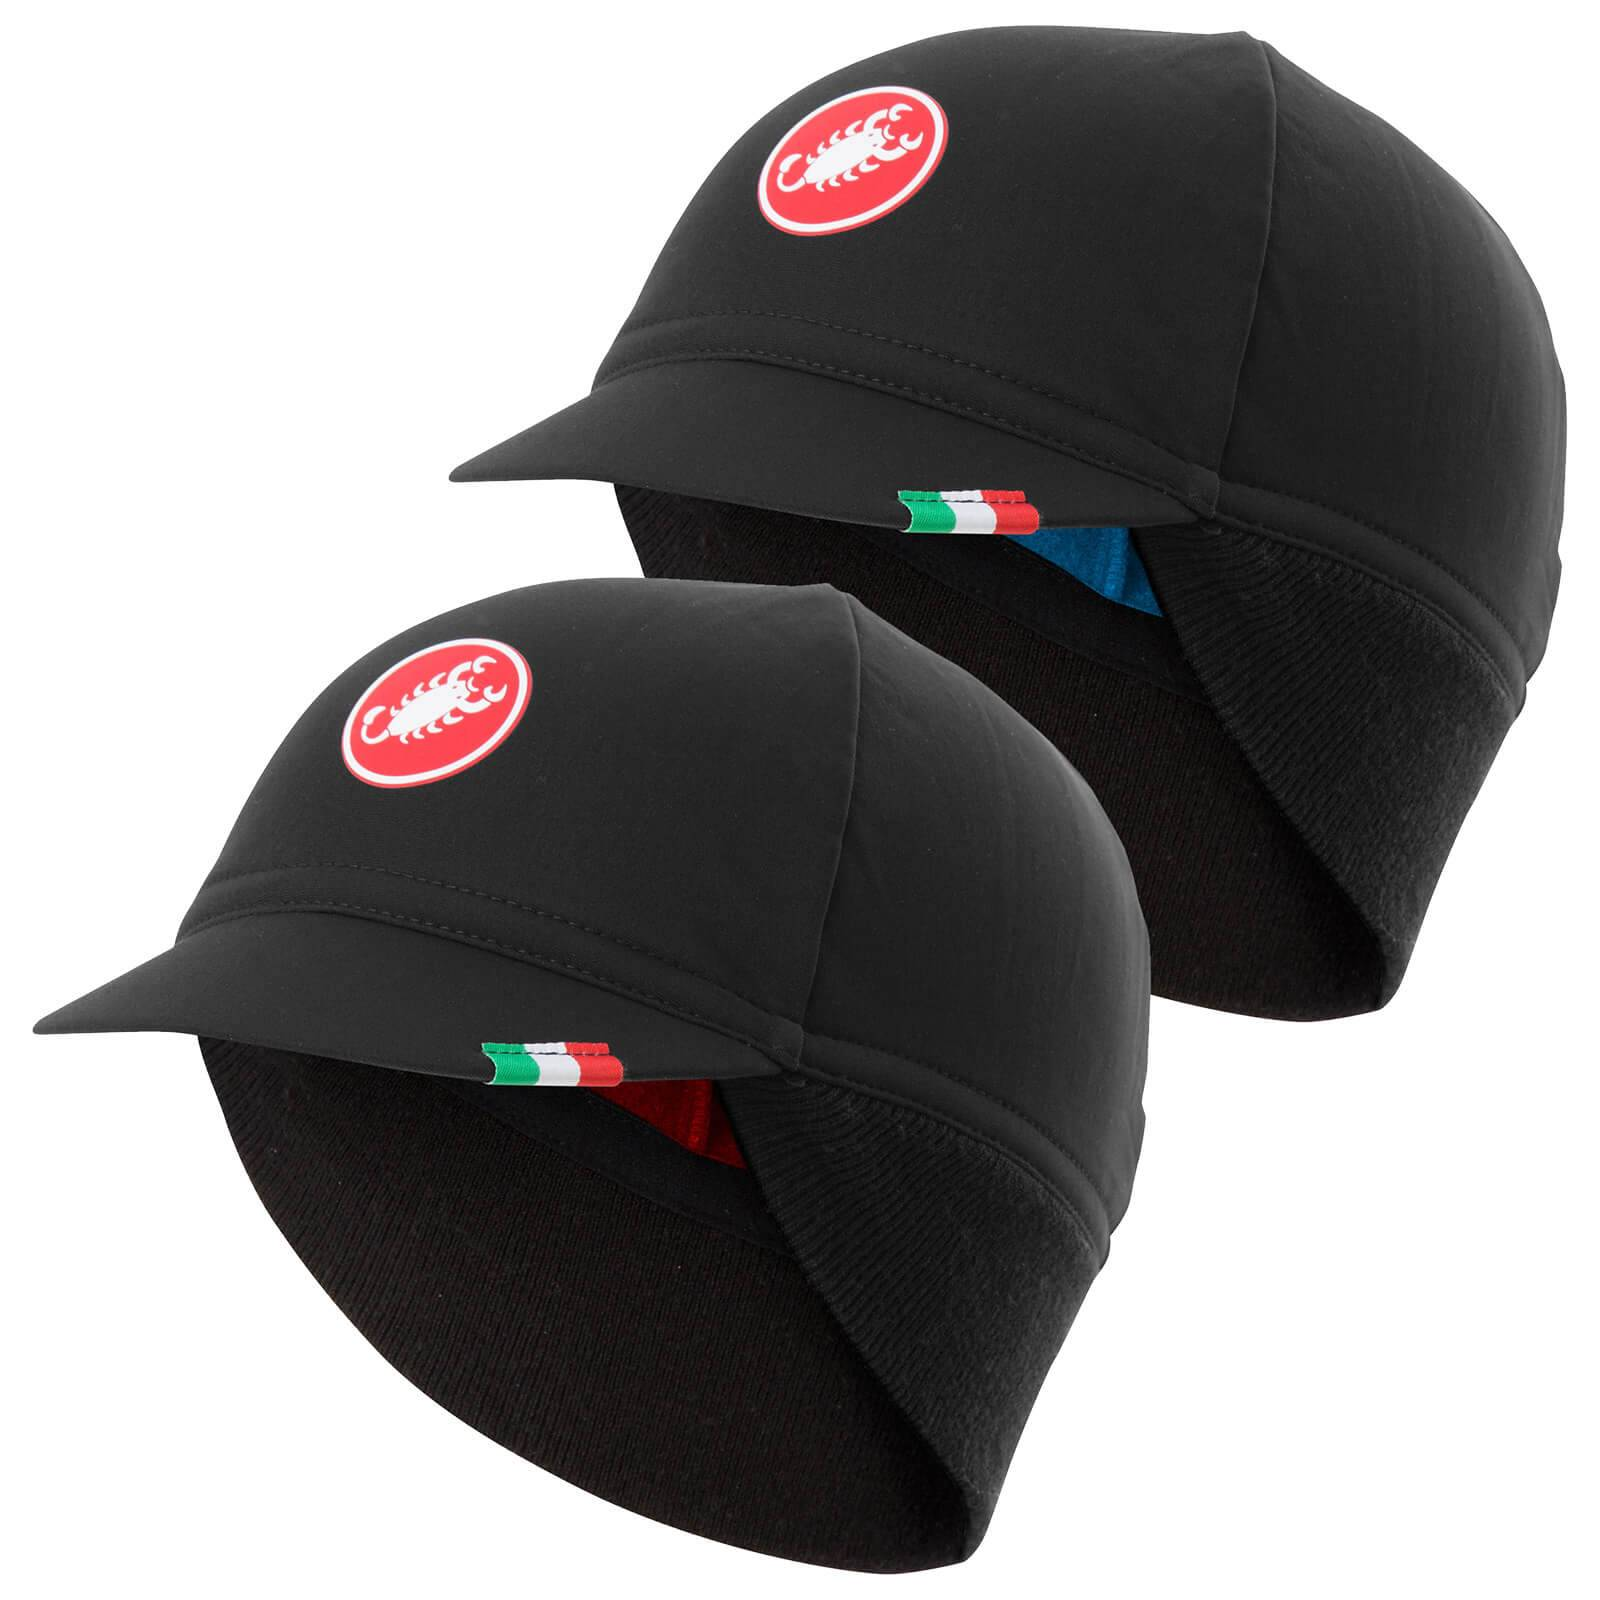 Castelli Difesa Thermal Cap - Black/Red